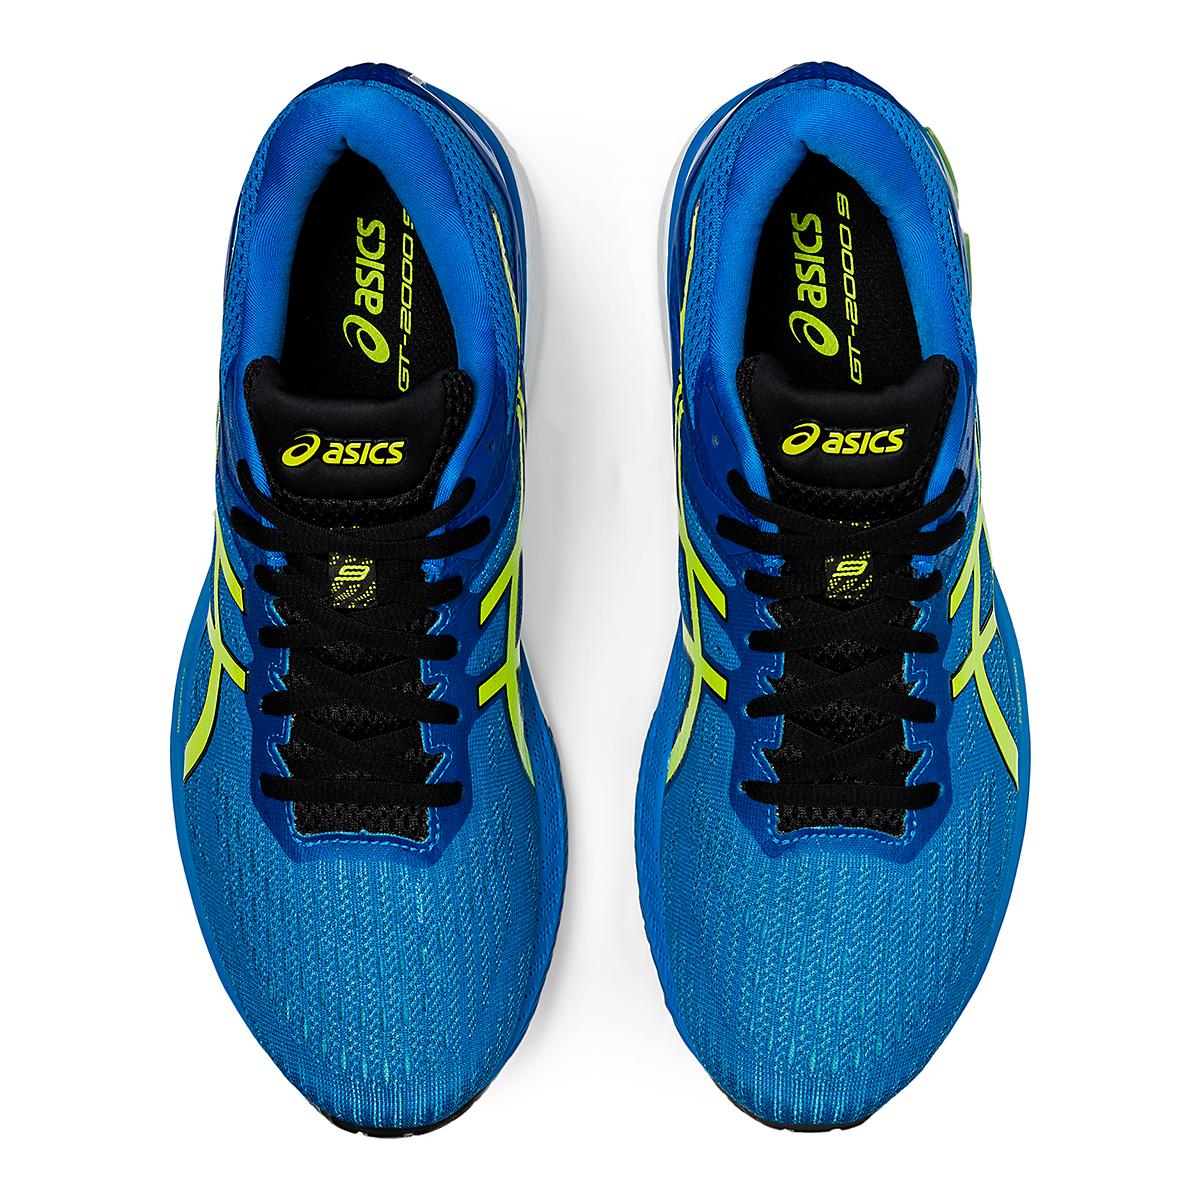 Men's Asics Gt-2000 9 Running Shoe - Color: Directoire Blue - Size: 7 - Width: Regular, Directoire Blue, large, image 5